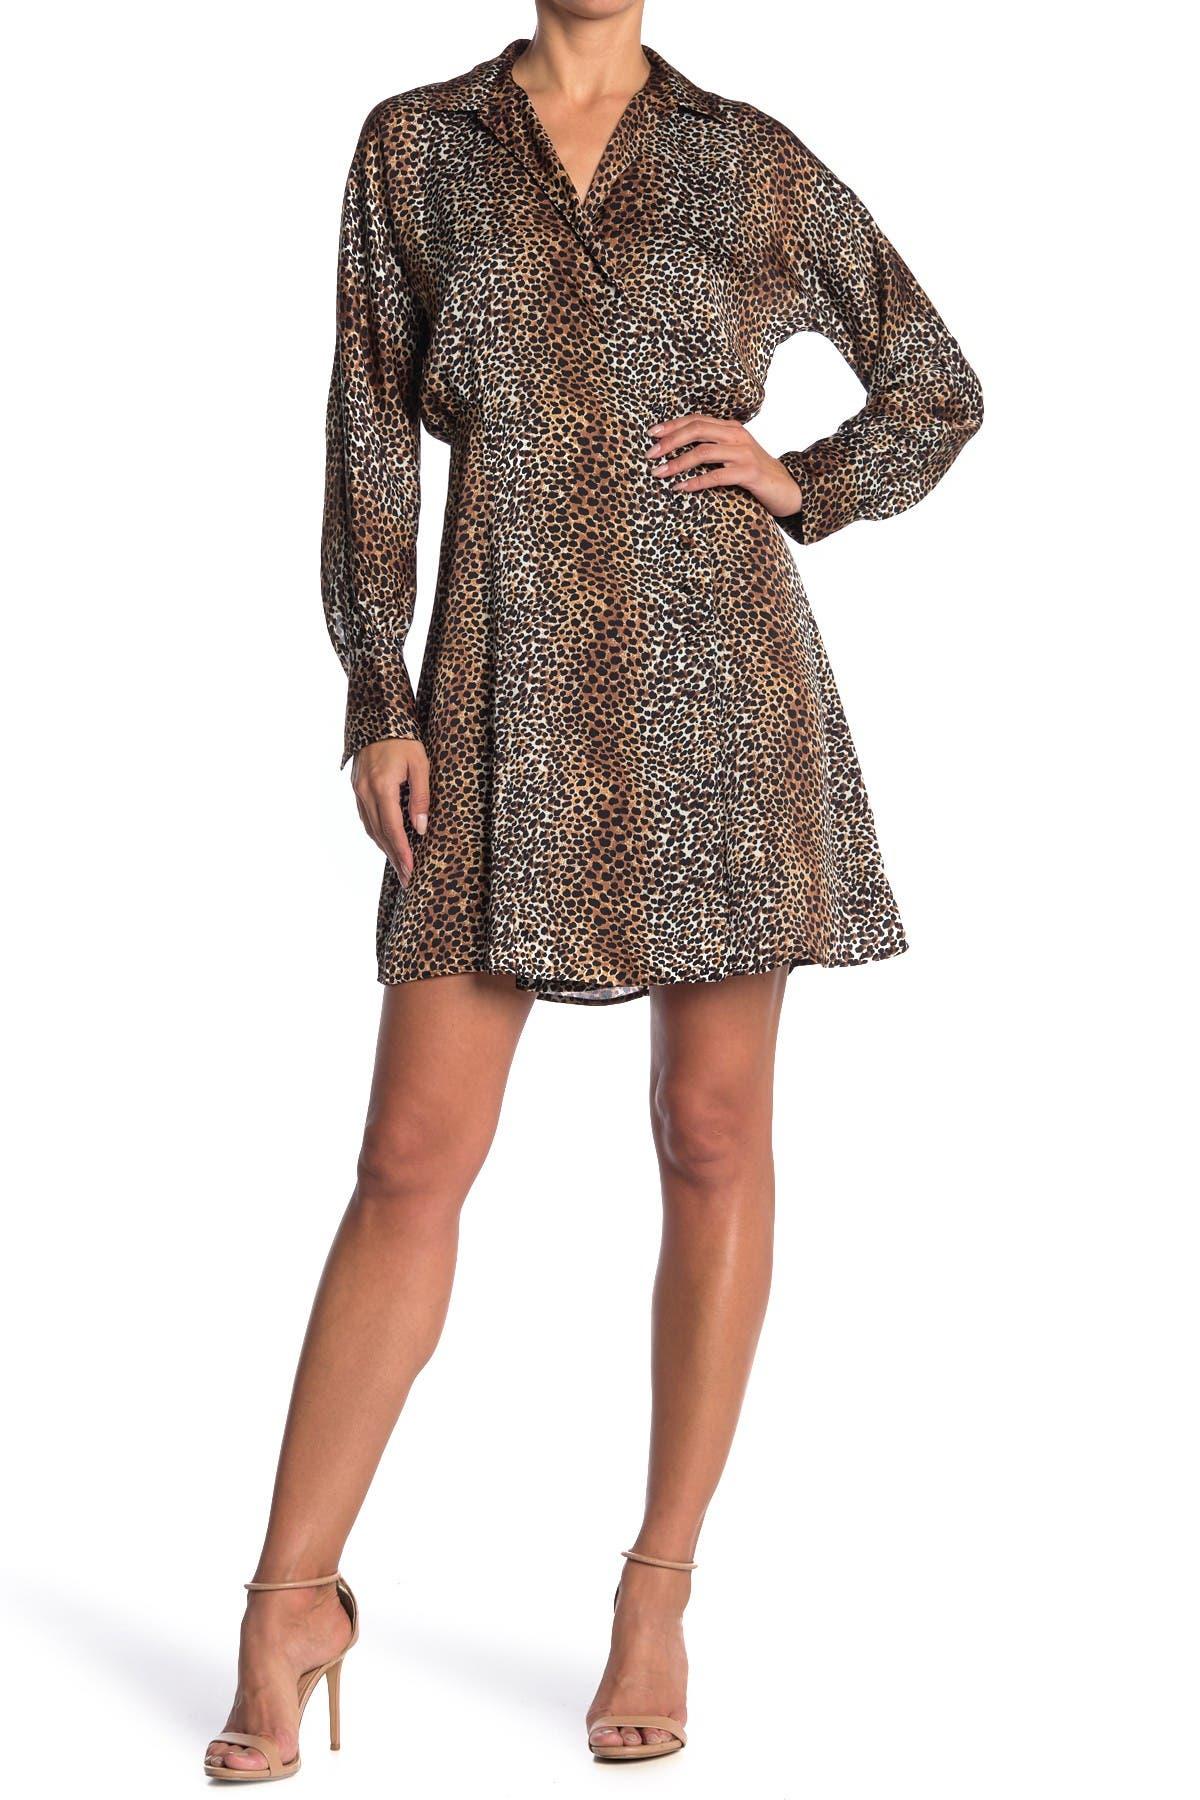 Image of Equipment Harmon Leopard Print Shirt Dress